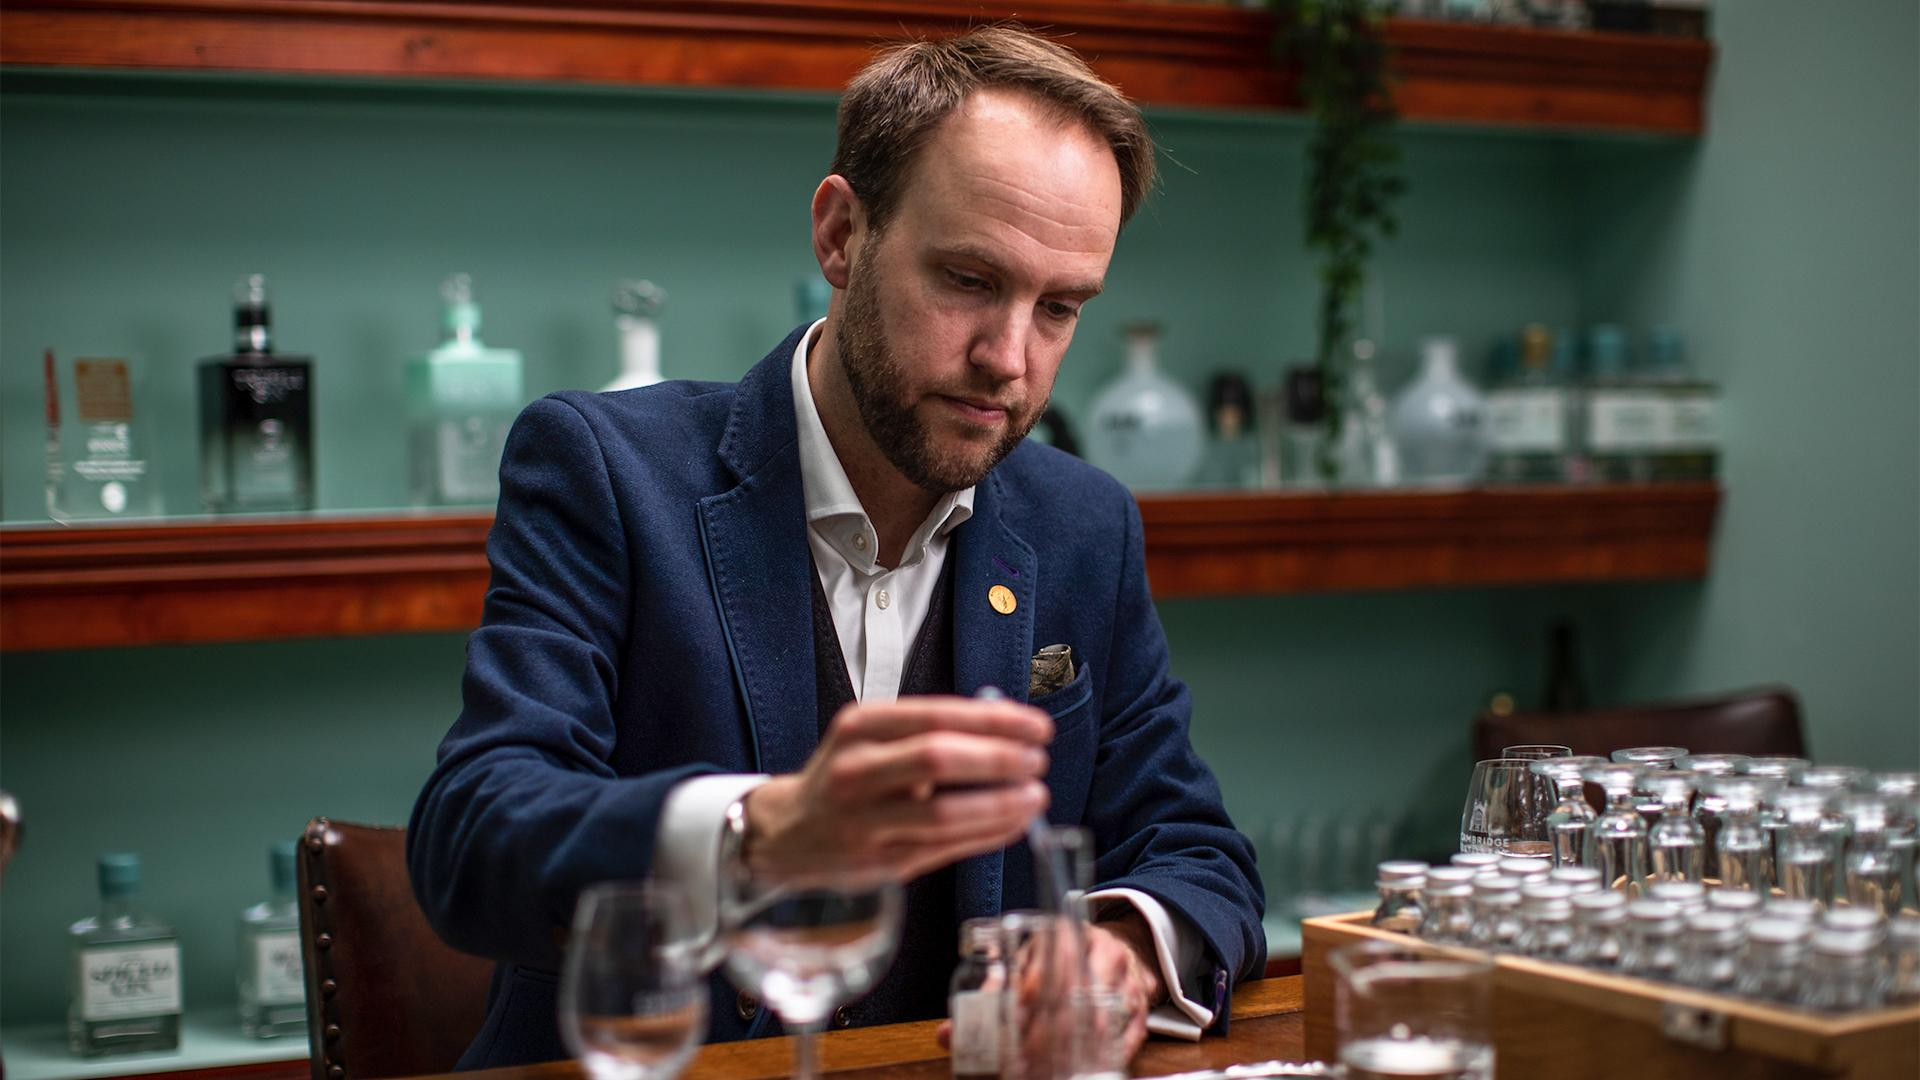 William Lowe, MW and Master Distiller at Cambridge Distillery